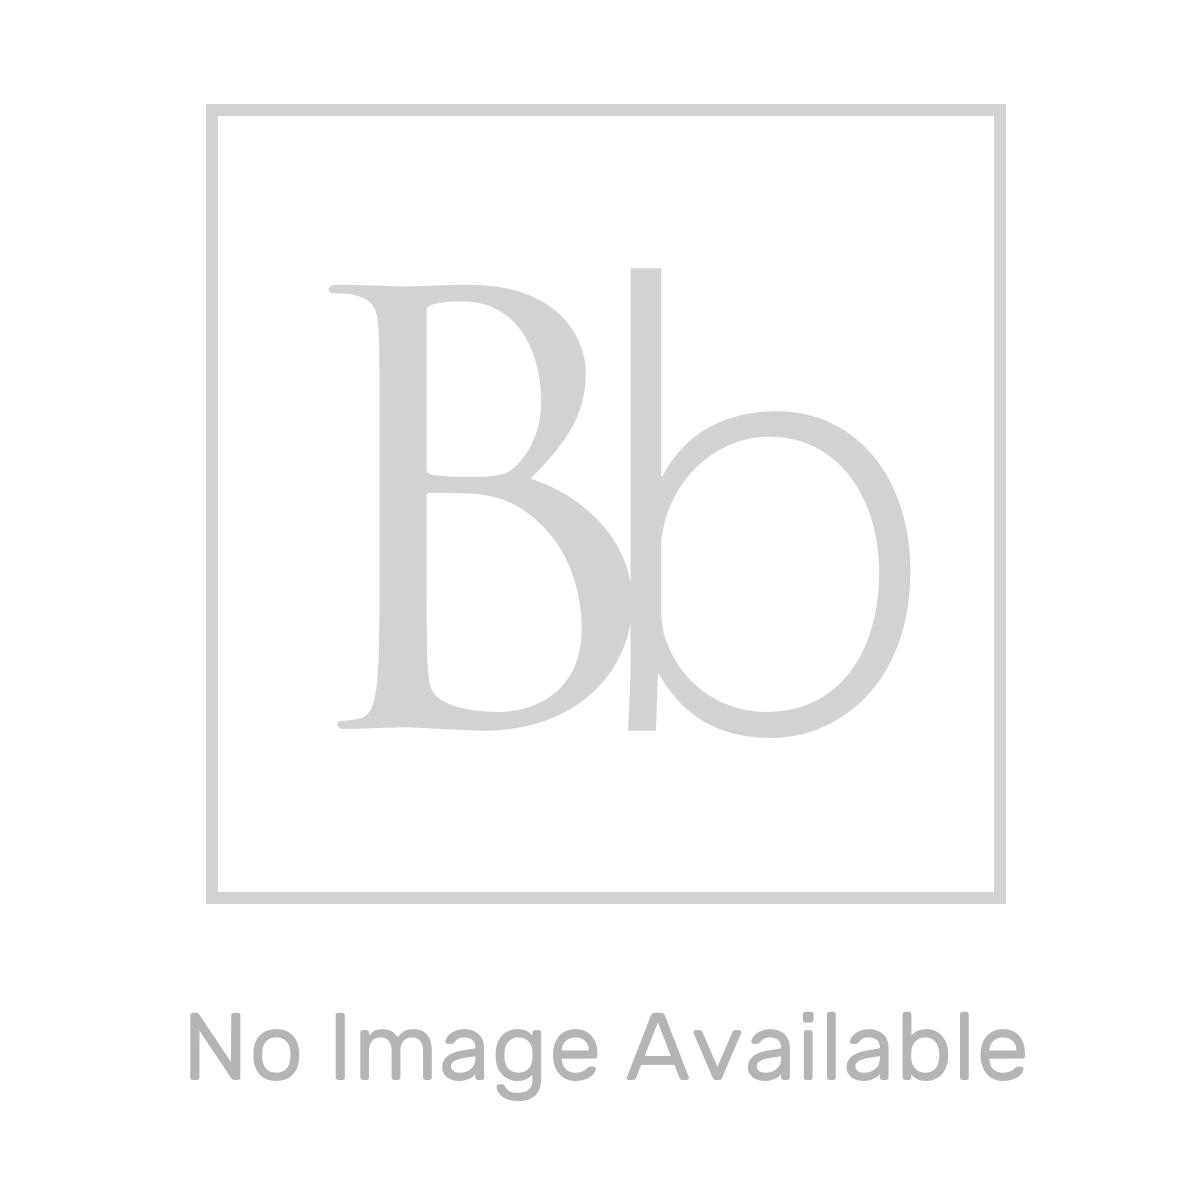 RAK Cubis Black Soap Dispenser Measurements